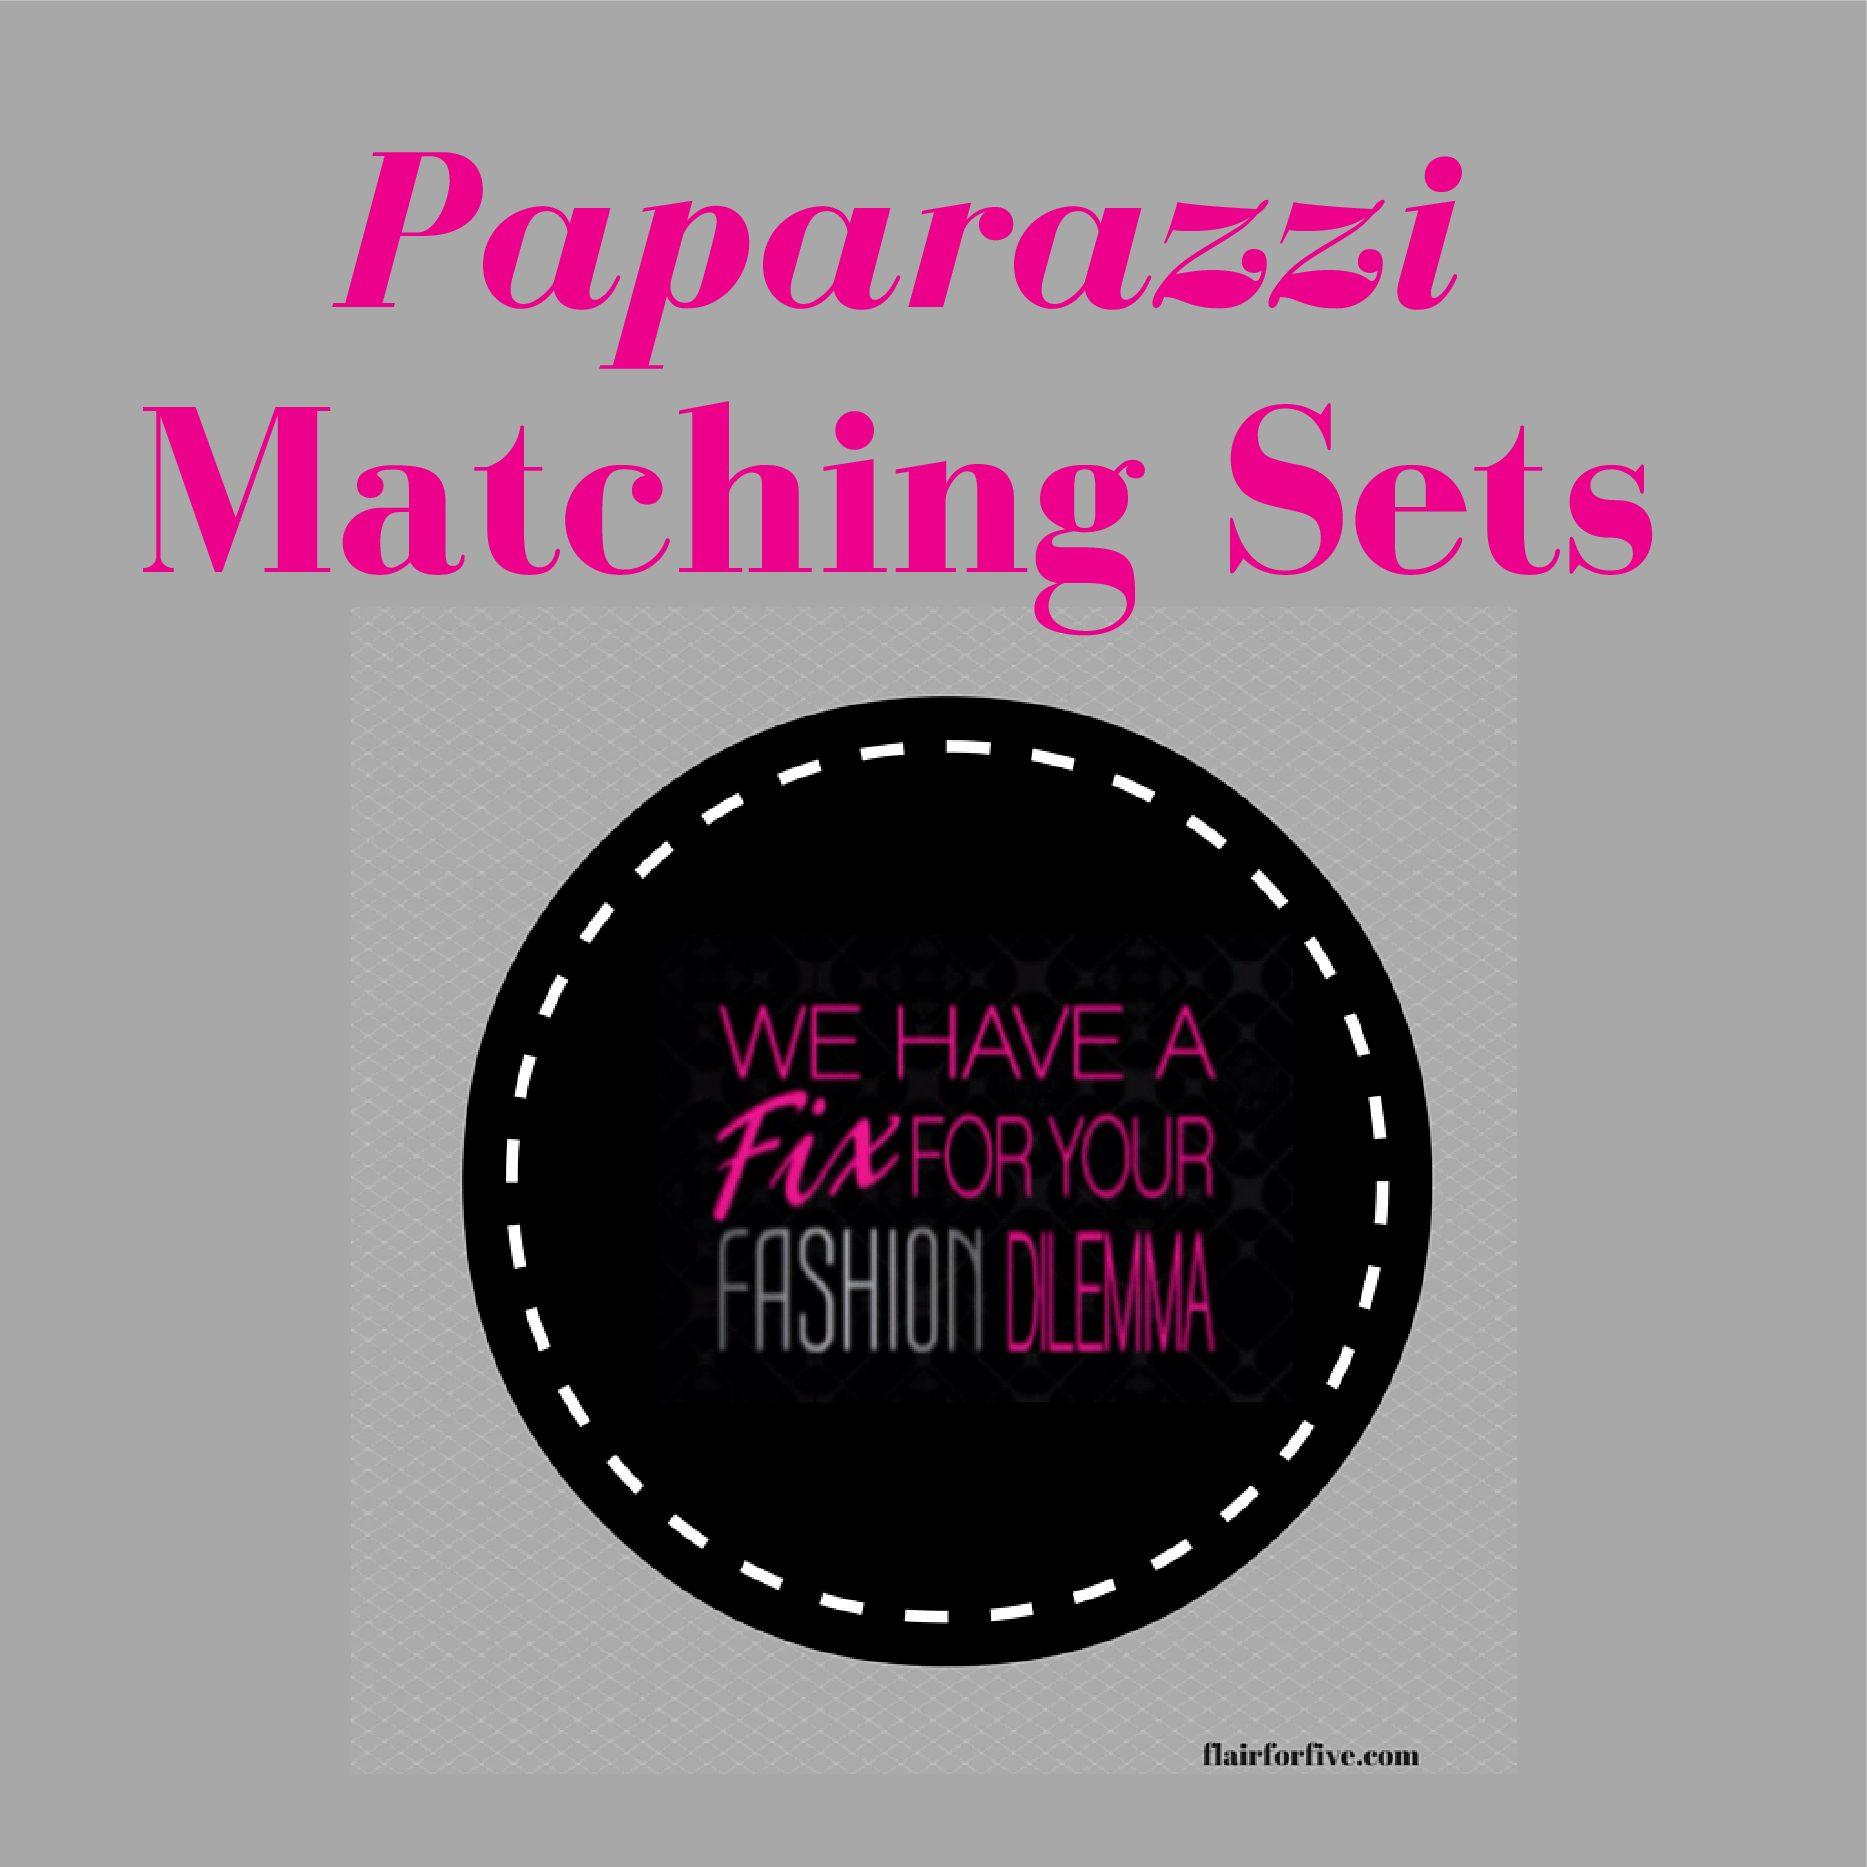 Paparazzi Sets $10-$20